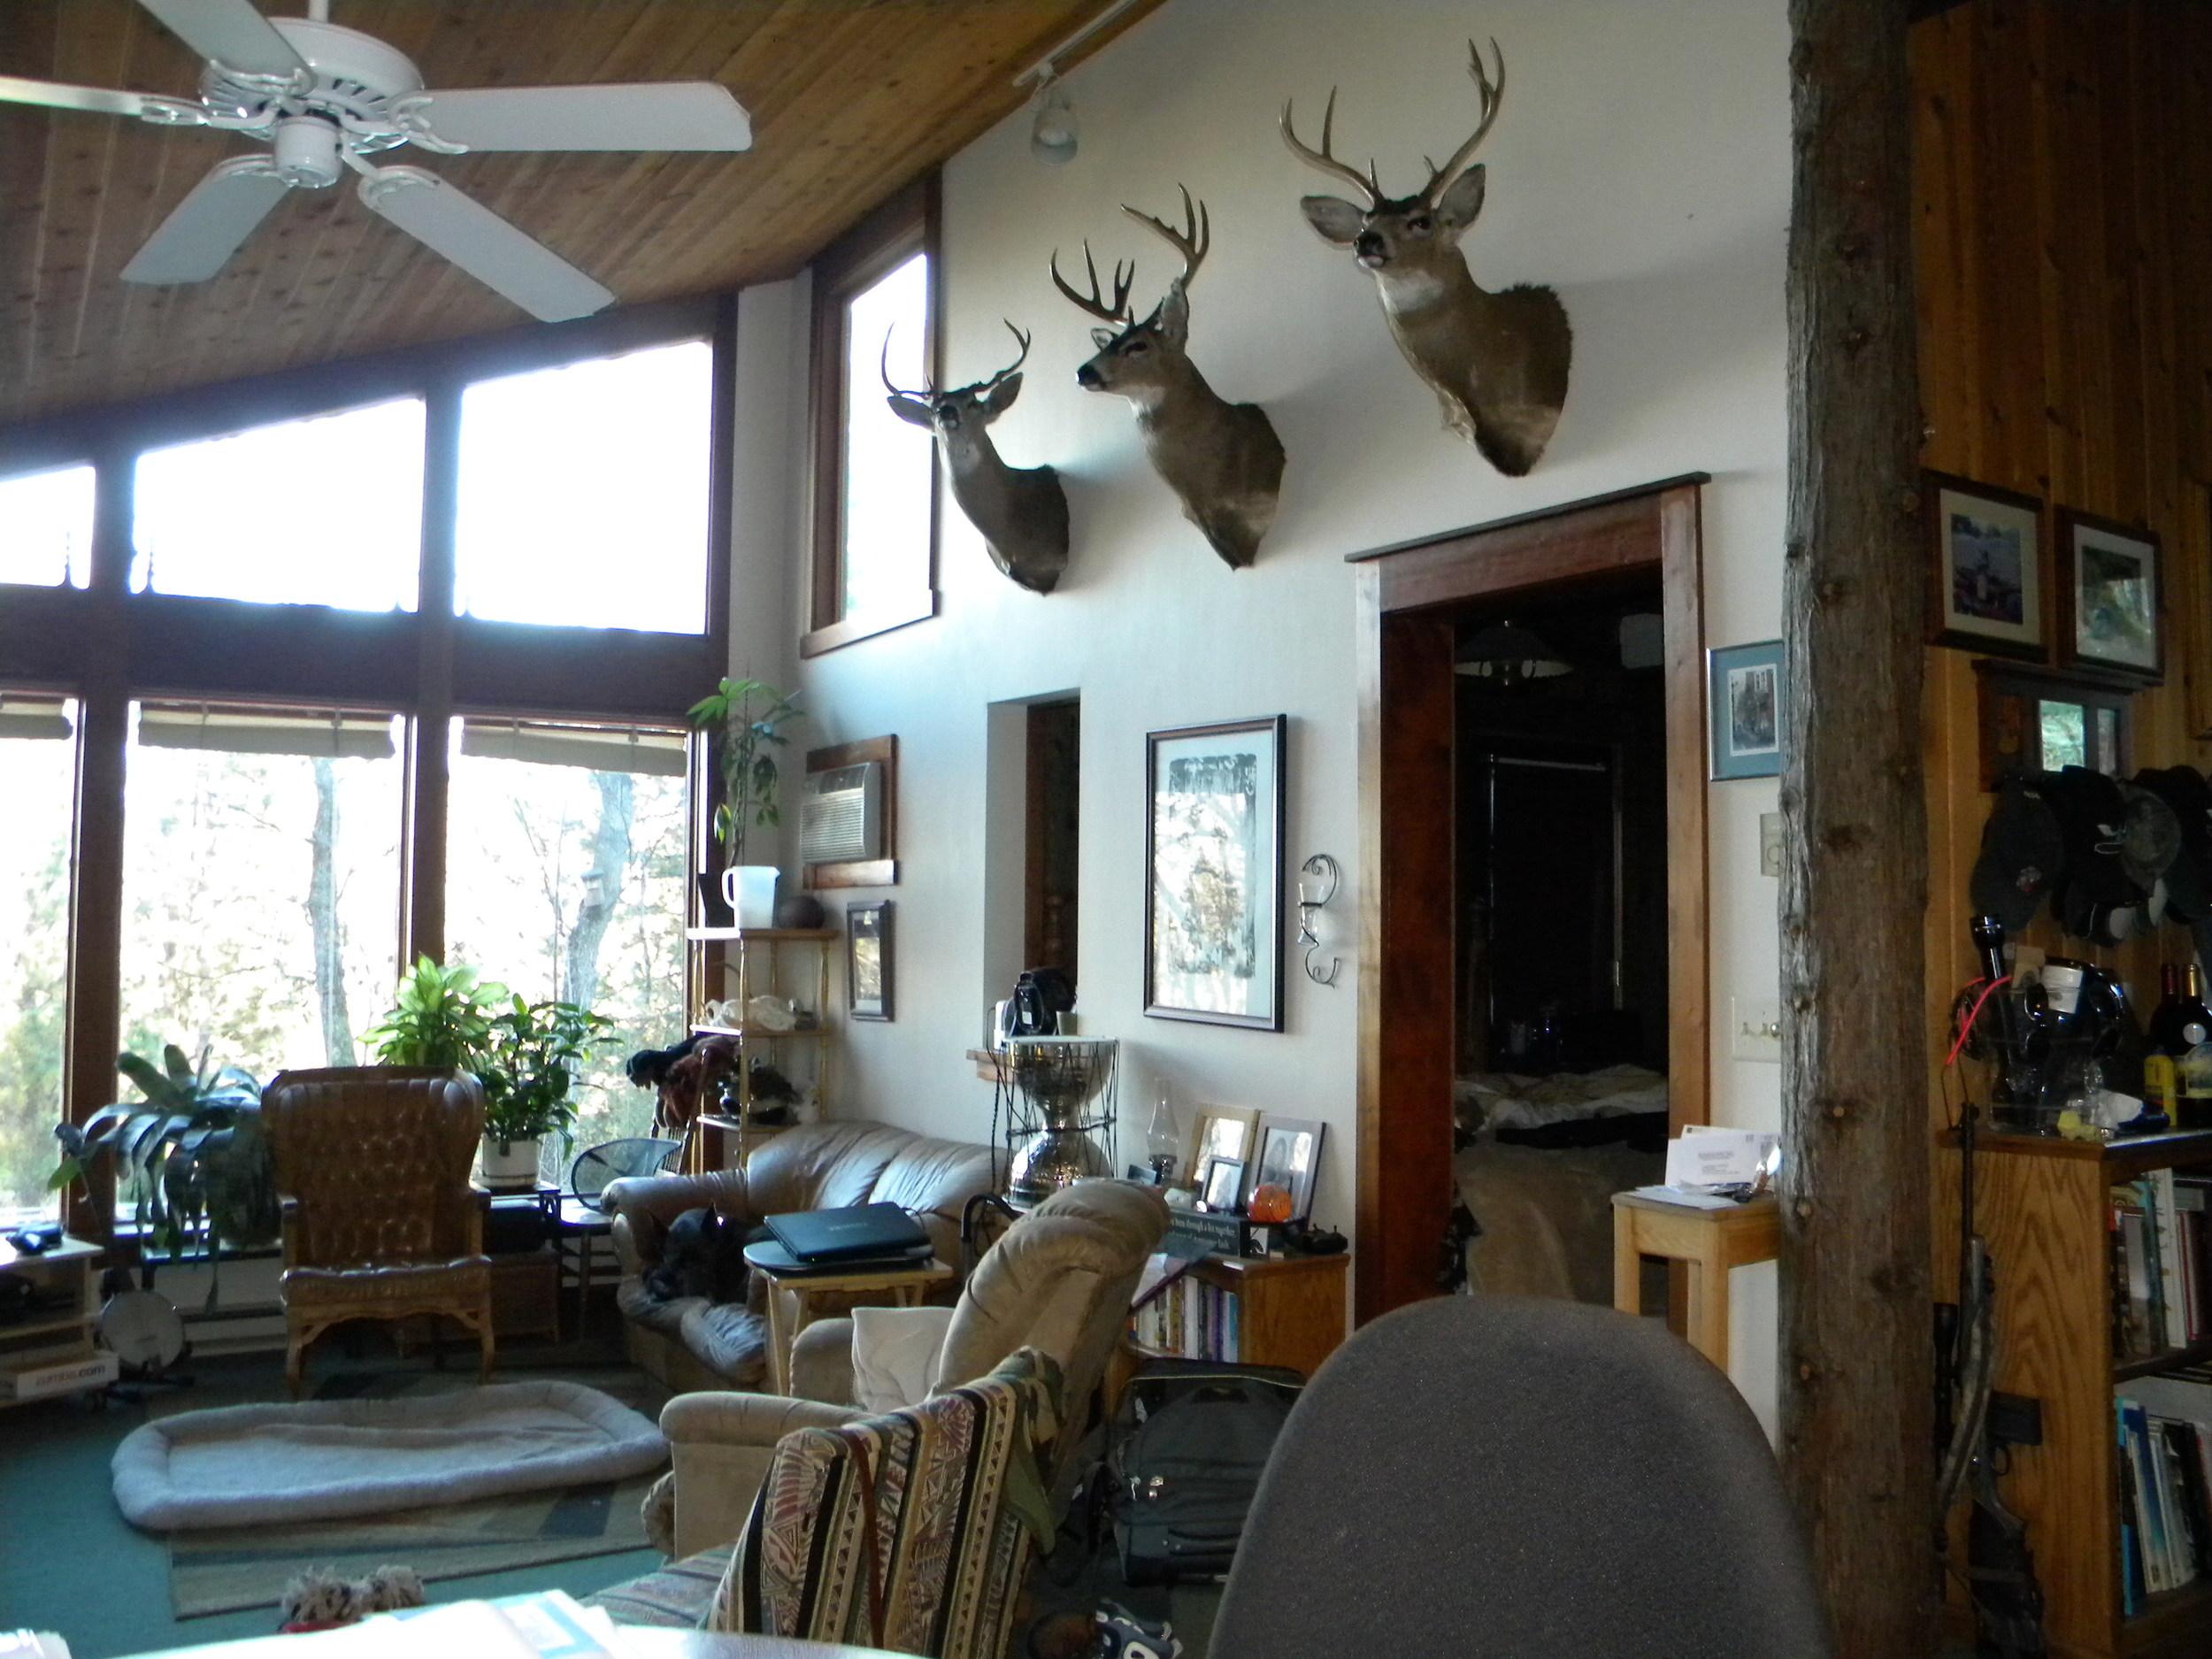 Hoff Residence, Talent, Oregon